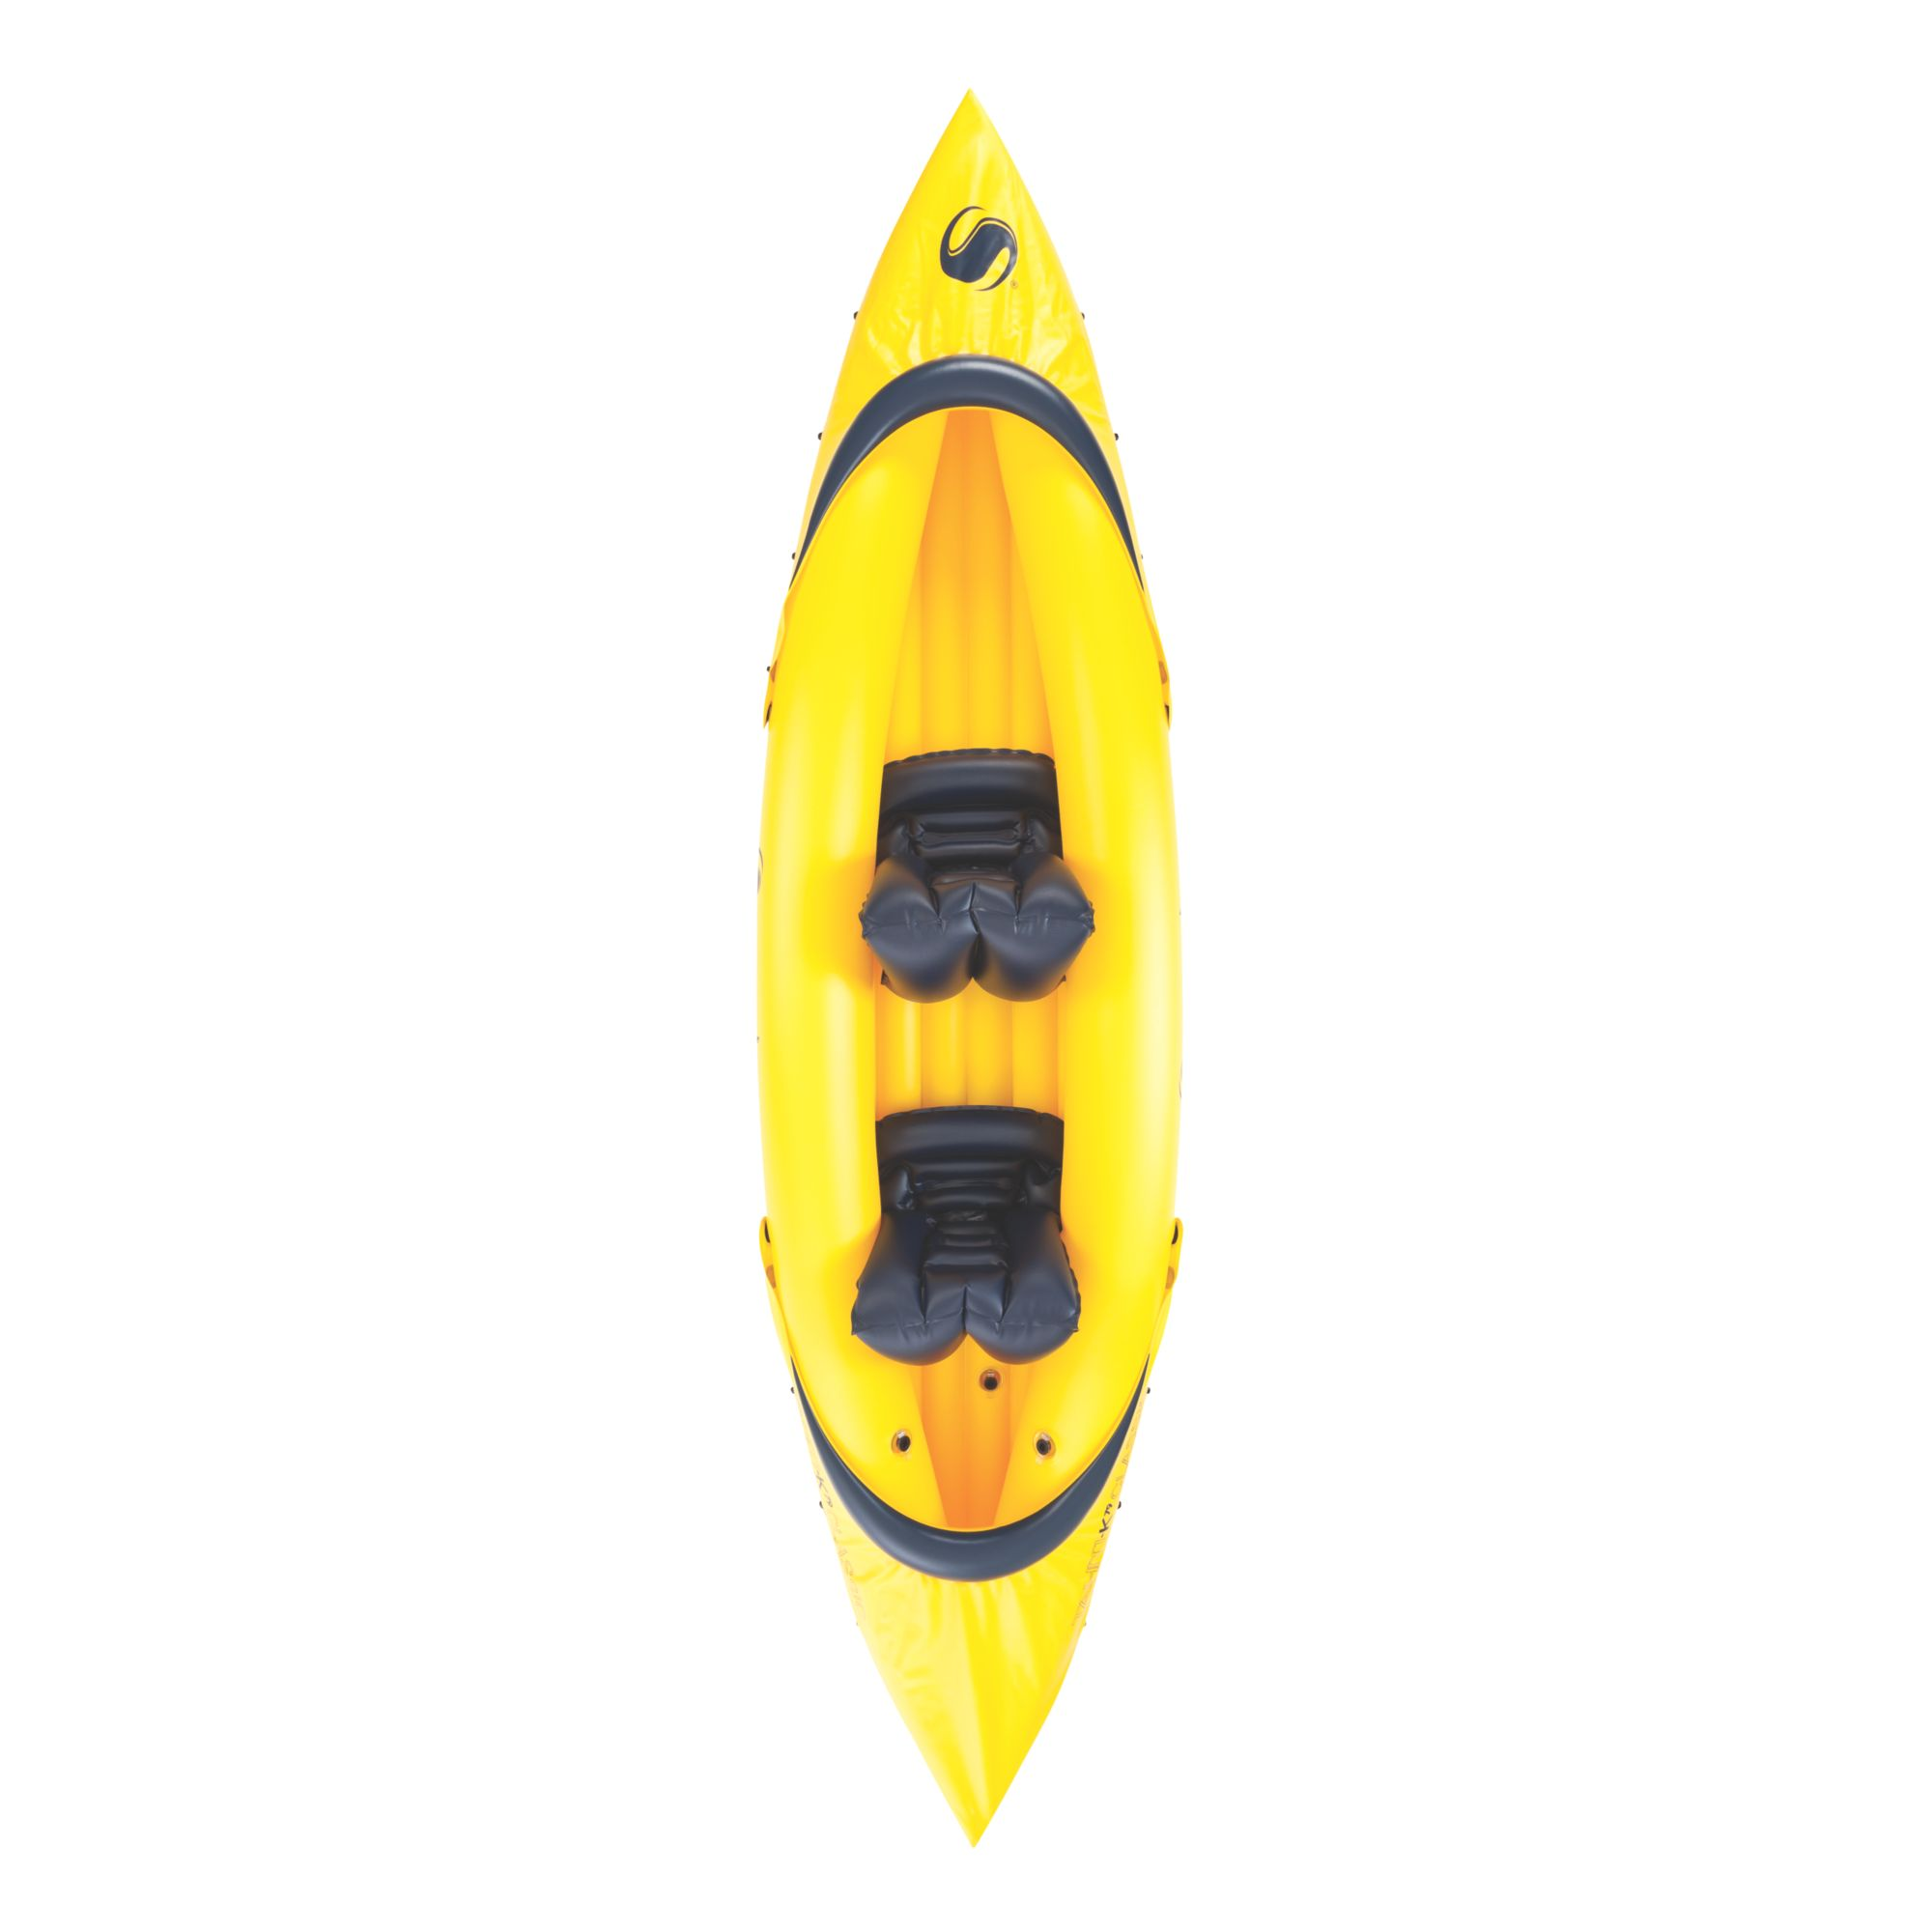 TahitiTM Classic 2 Person Kayak